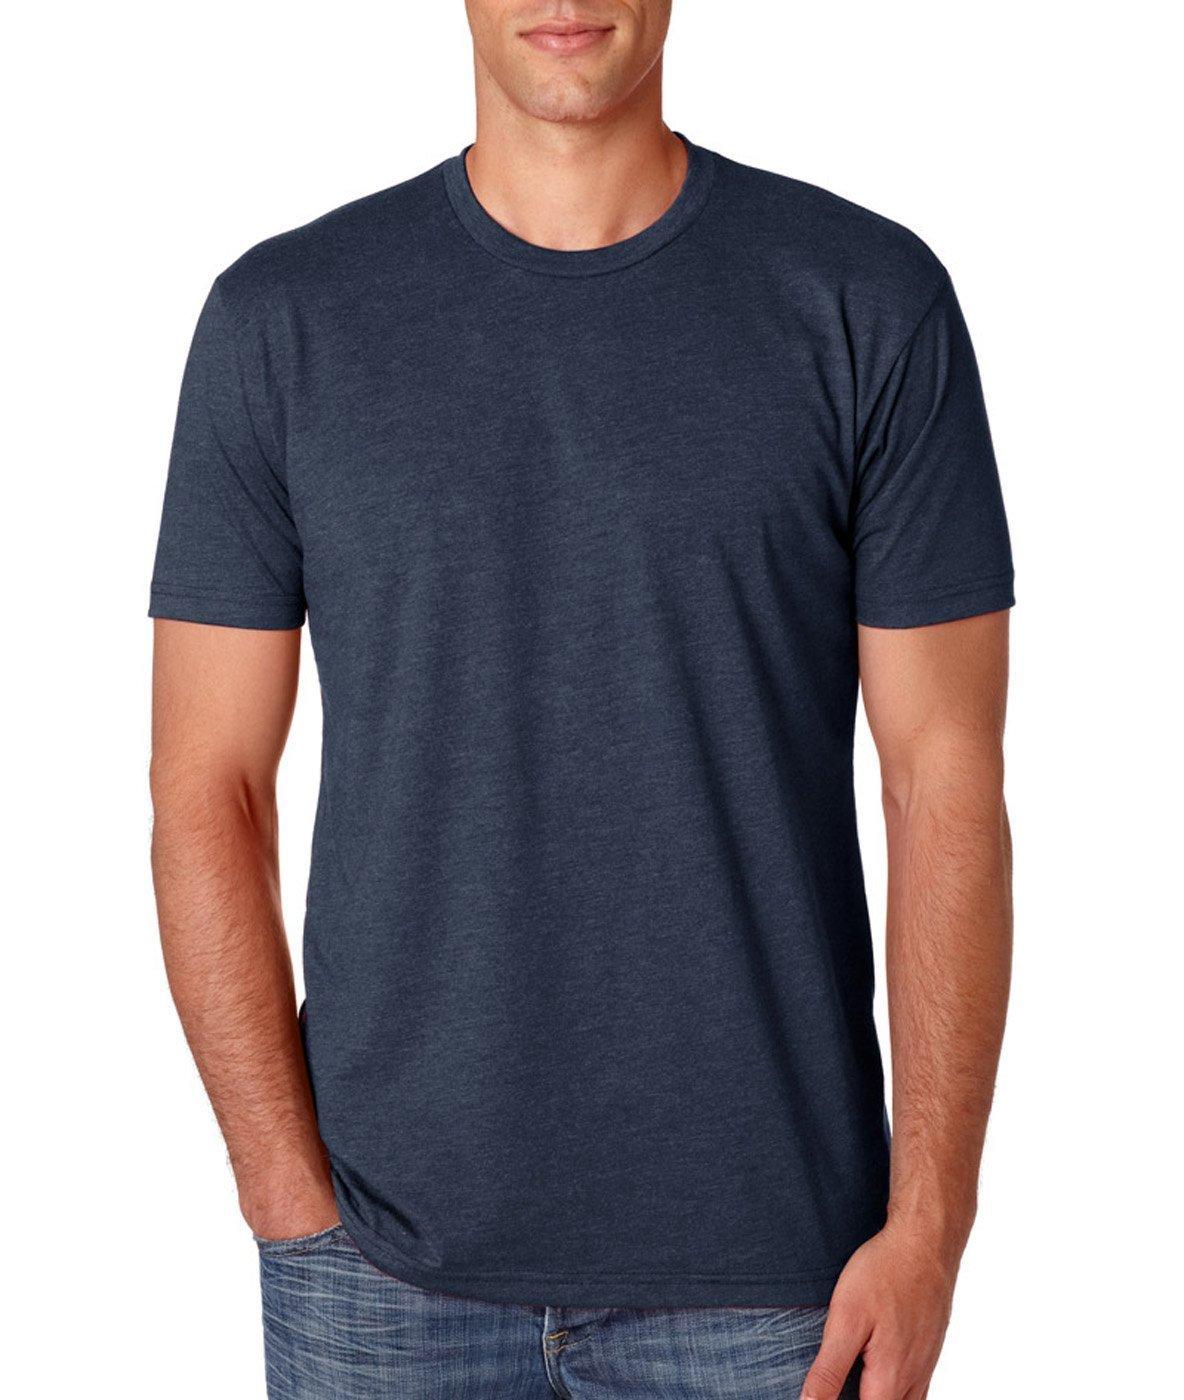 Next Level Apparel メンズ CVC クルーネック ジャージ Tシャツ B07D5HGW4G X-Large|Charcoal + Midnight Navy (2 Shirts) Charcoal + Midnight Navy (2 Shirts) X-Large